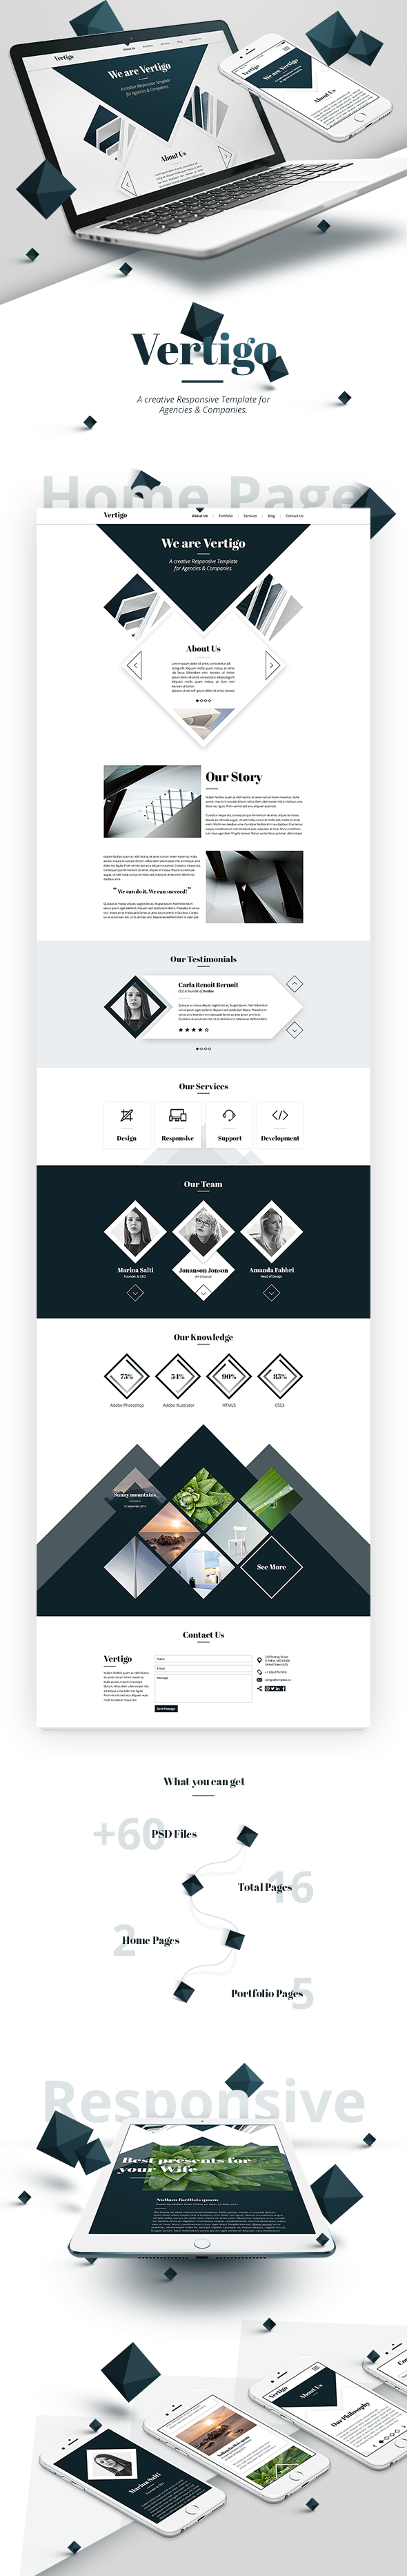 Vertigo - Creative Theme for Agencies & Companies - 3